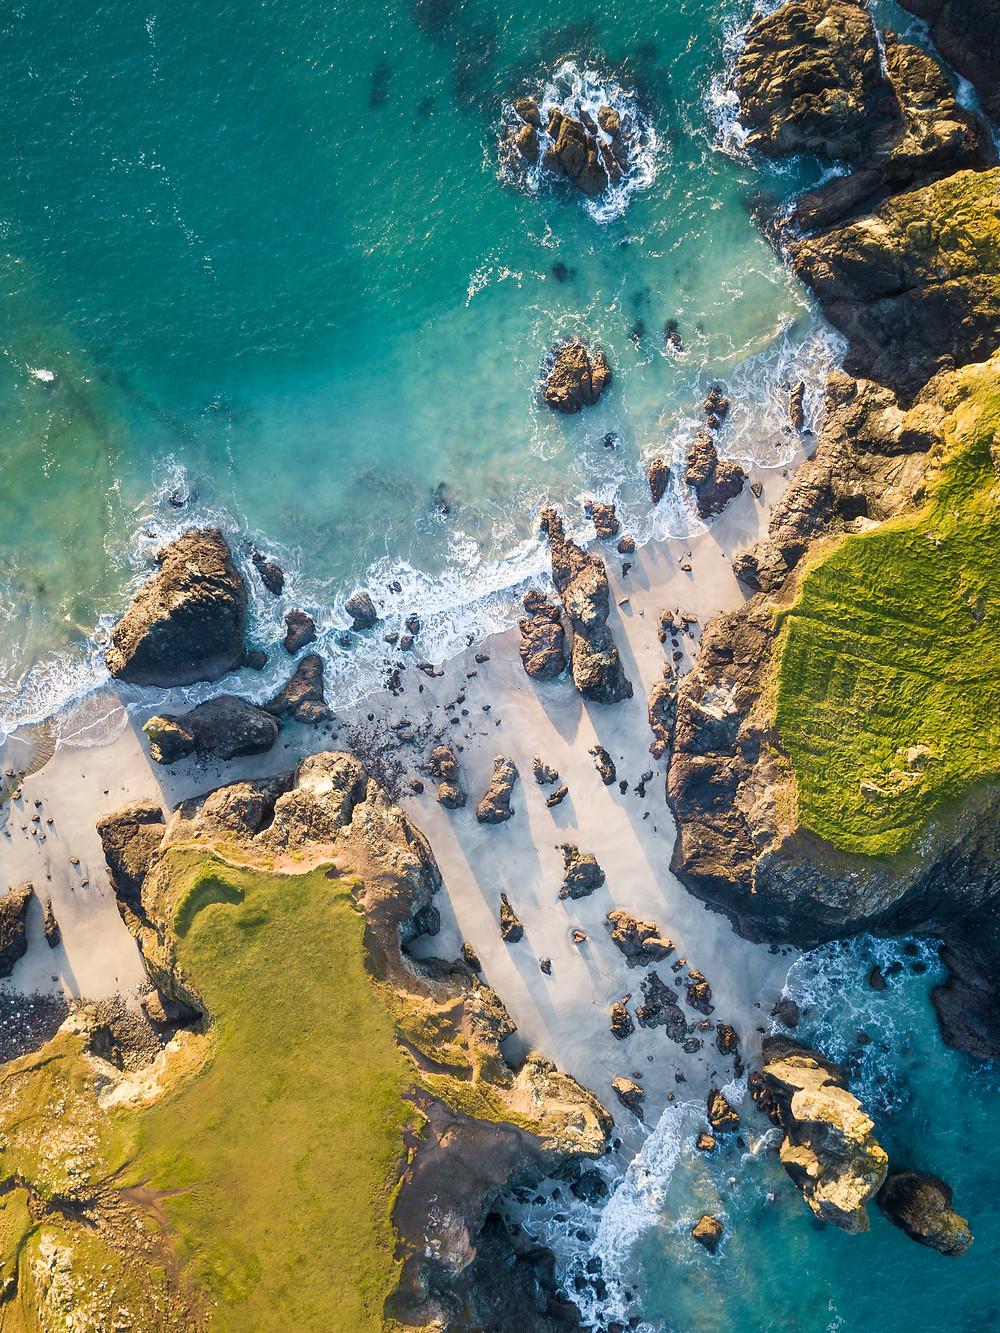 Aerial Drone Shot At Kynance Cove, The Lizard Peninsula, Cornwall, Cornwall Road Trip 1 Week 2 week Itinerary guide